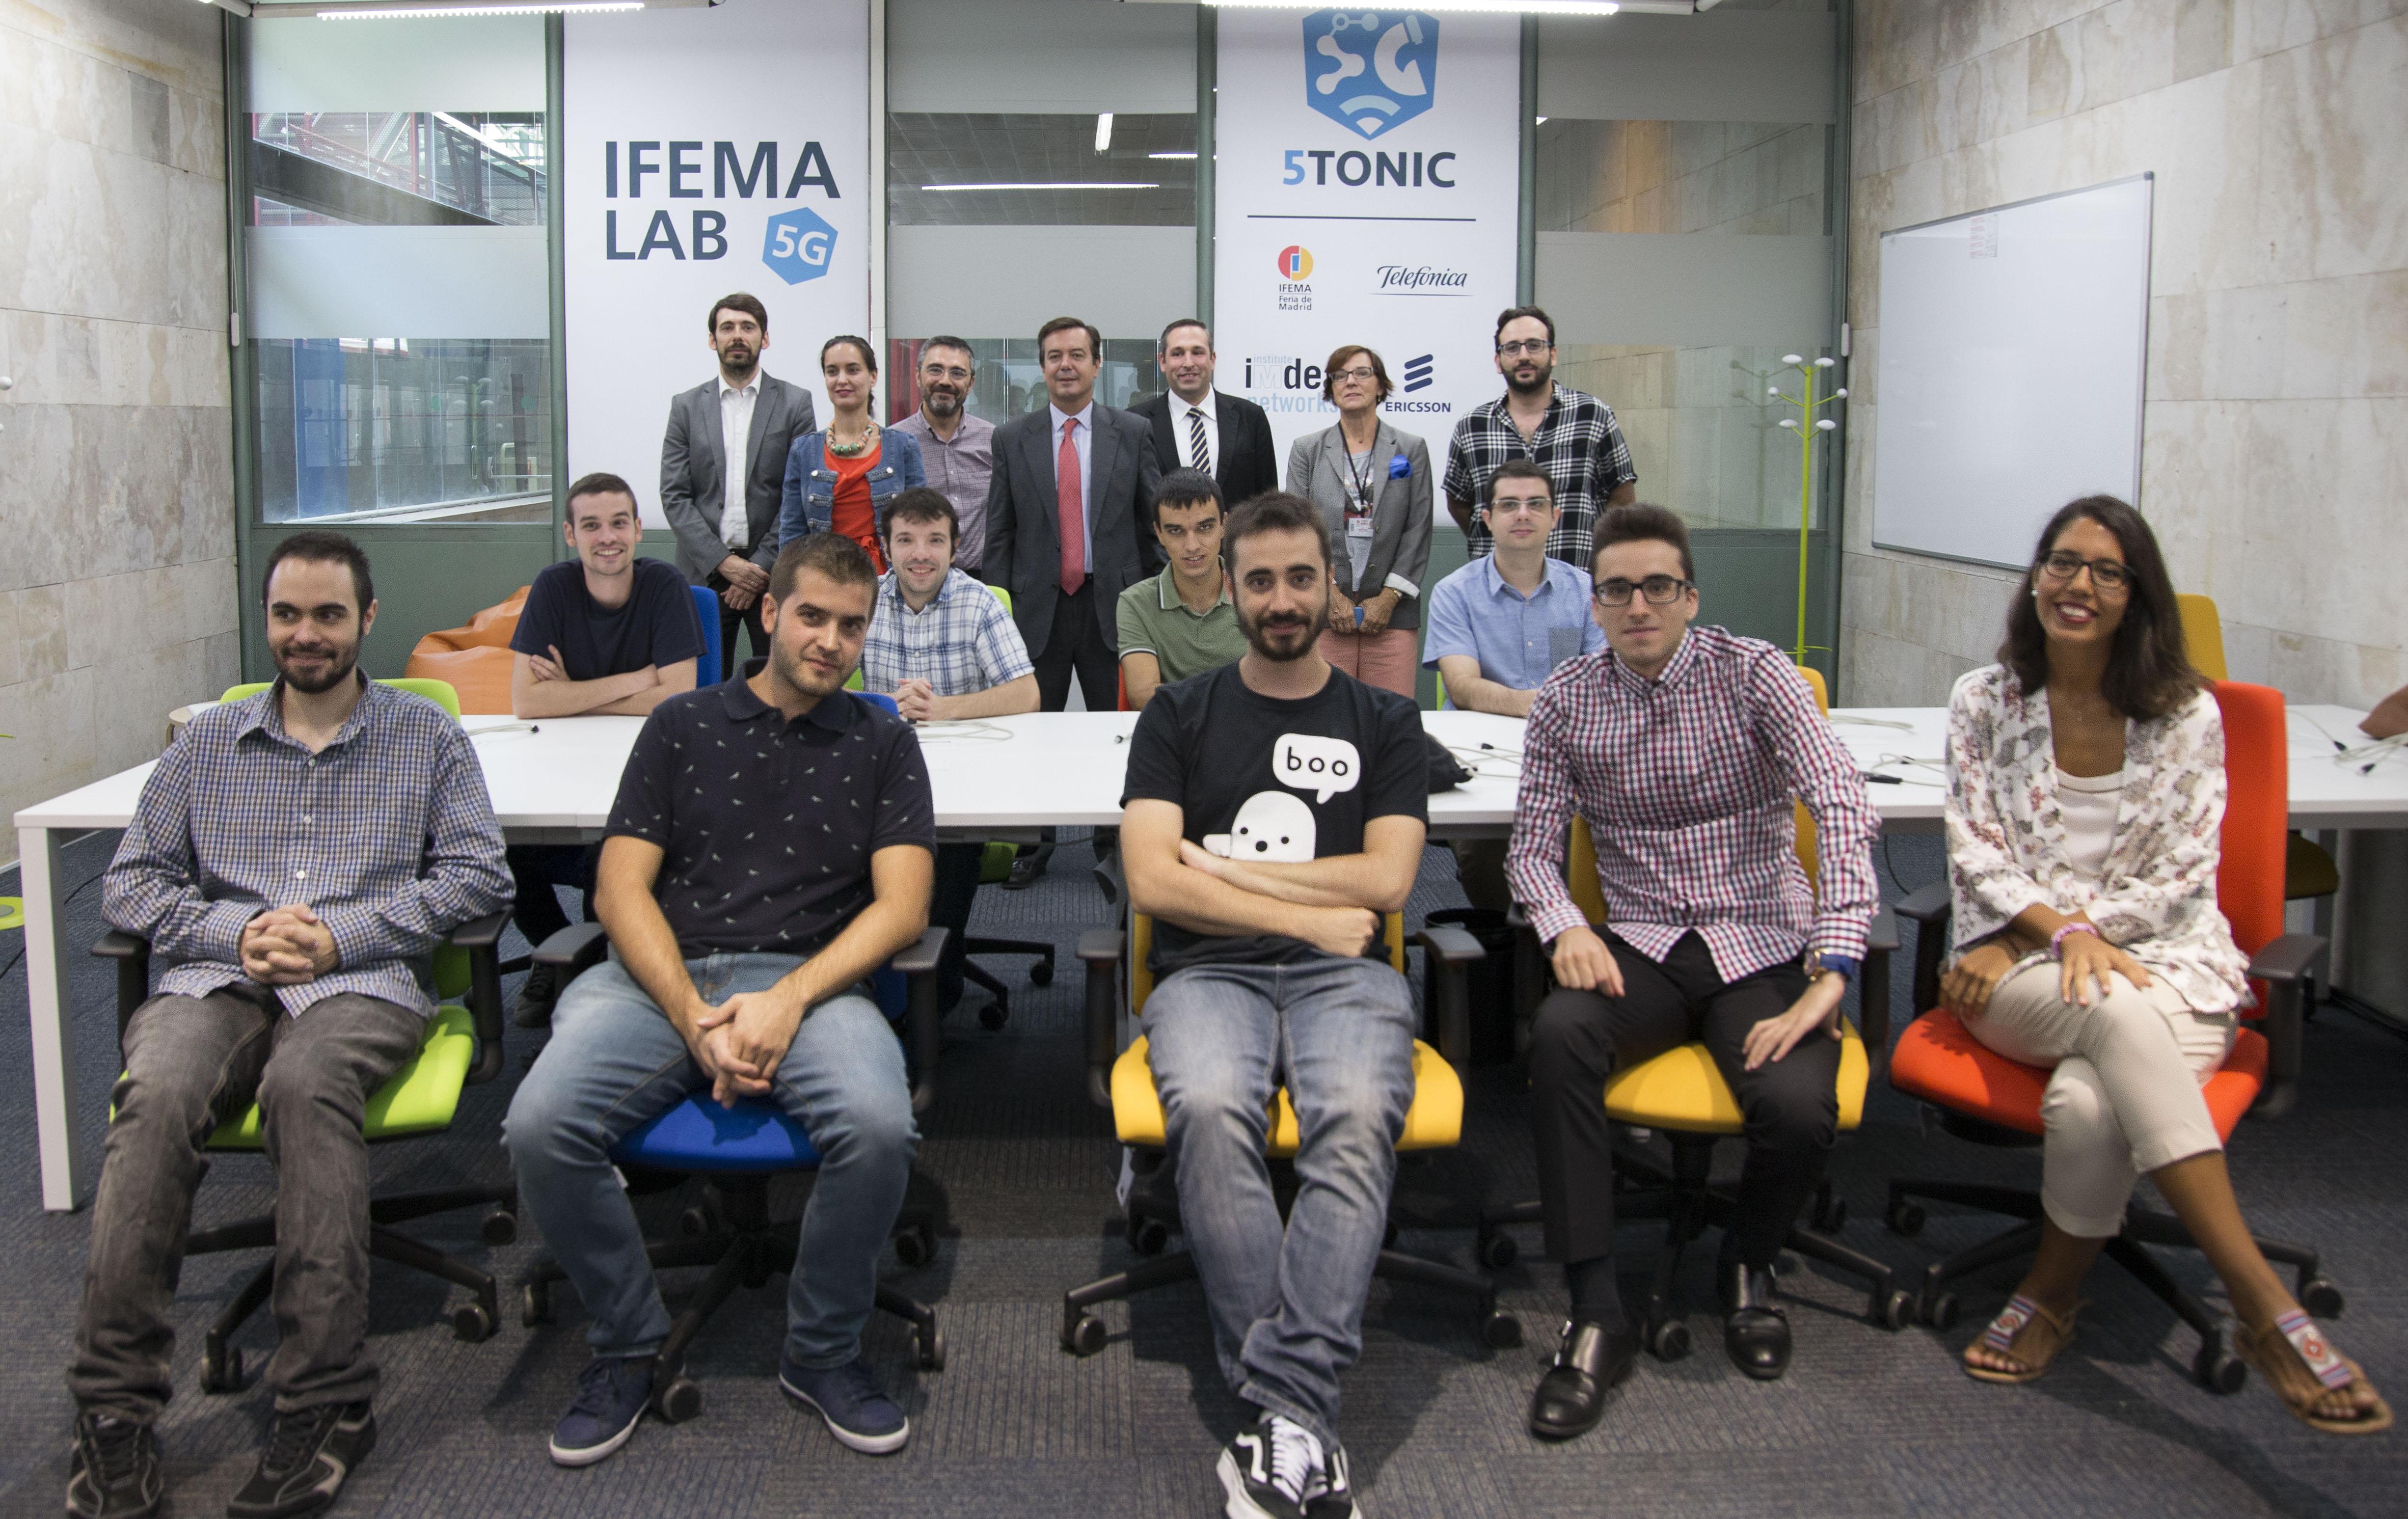 IFEMA 5G LAB Team Presentation